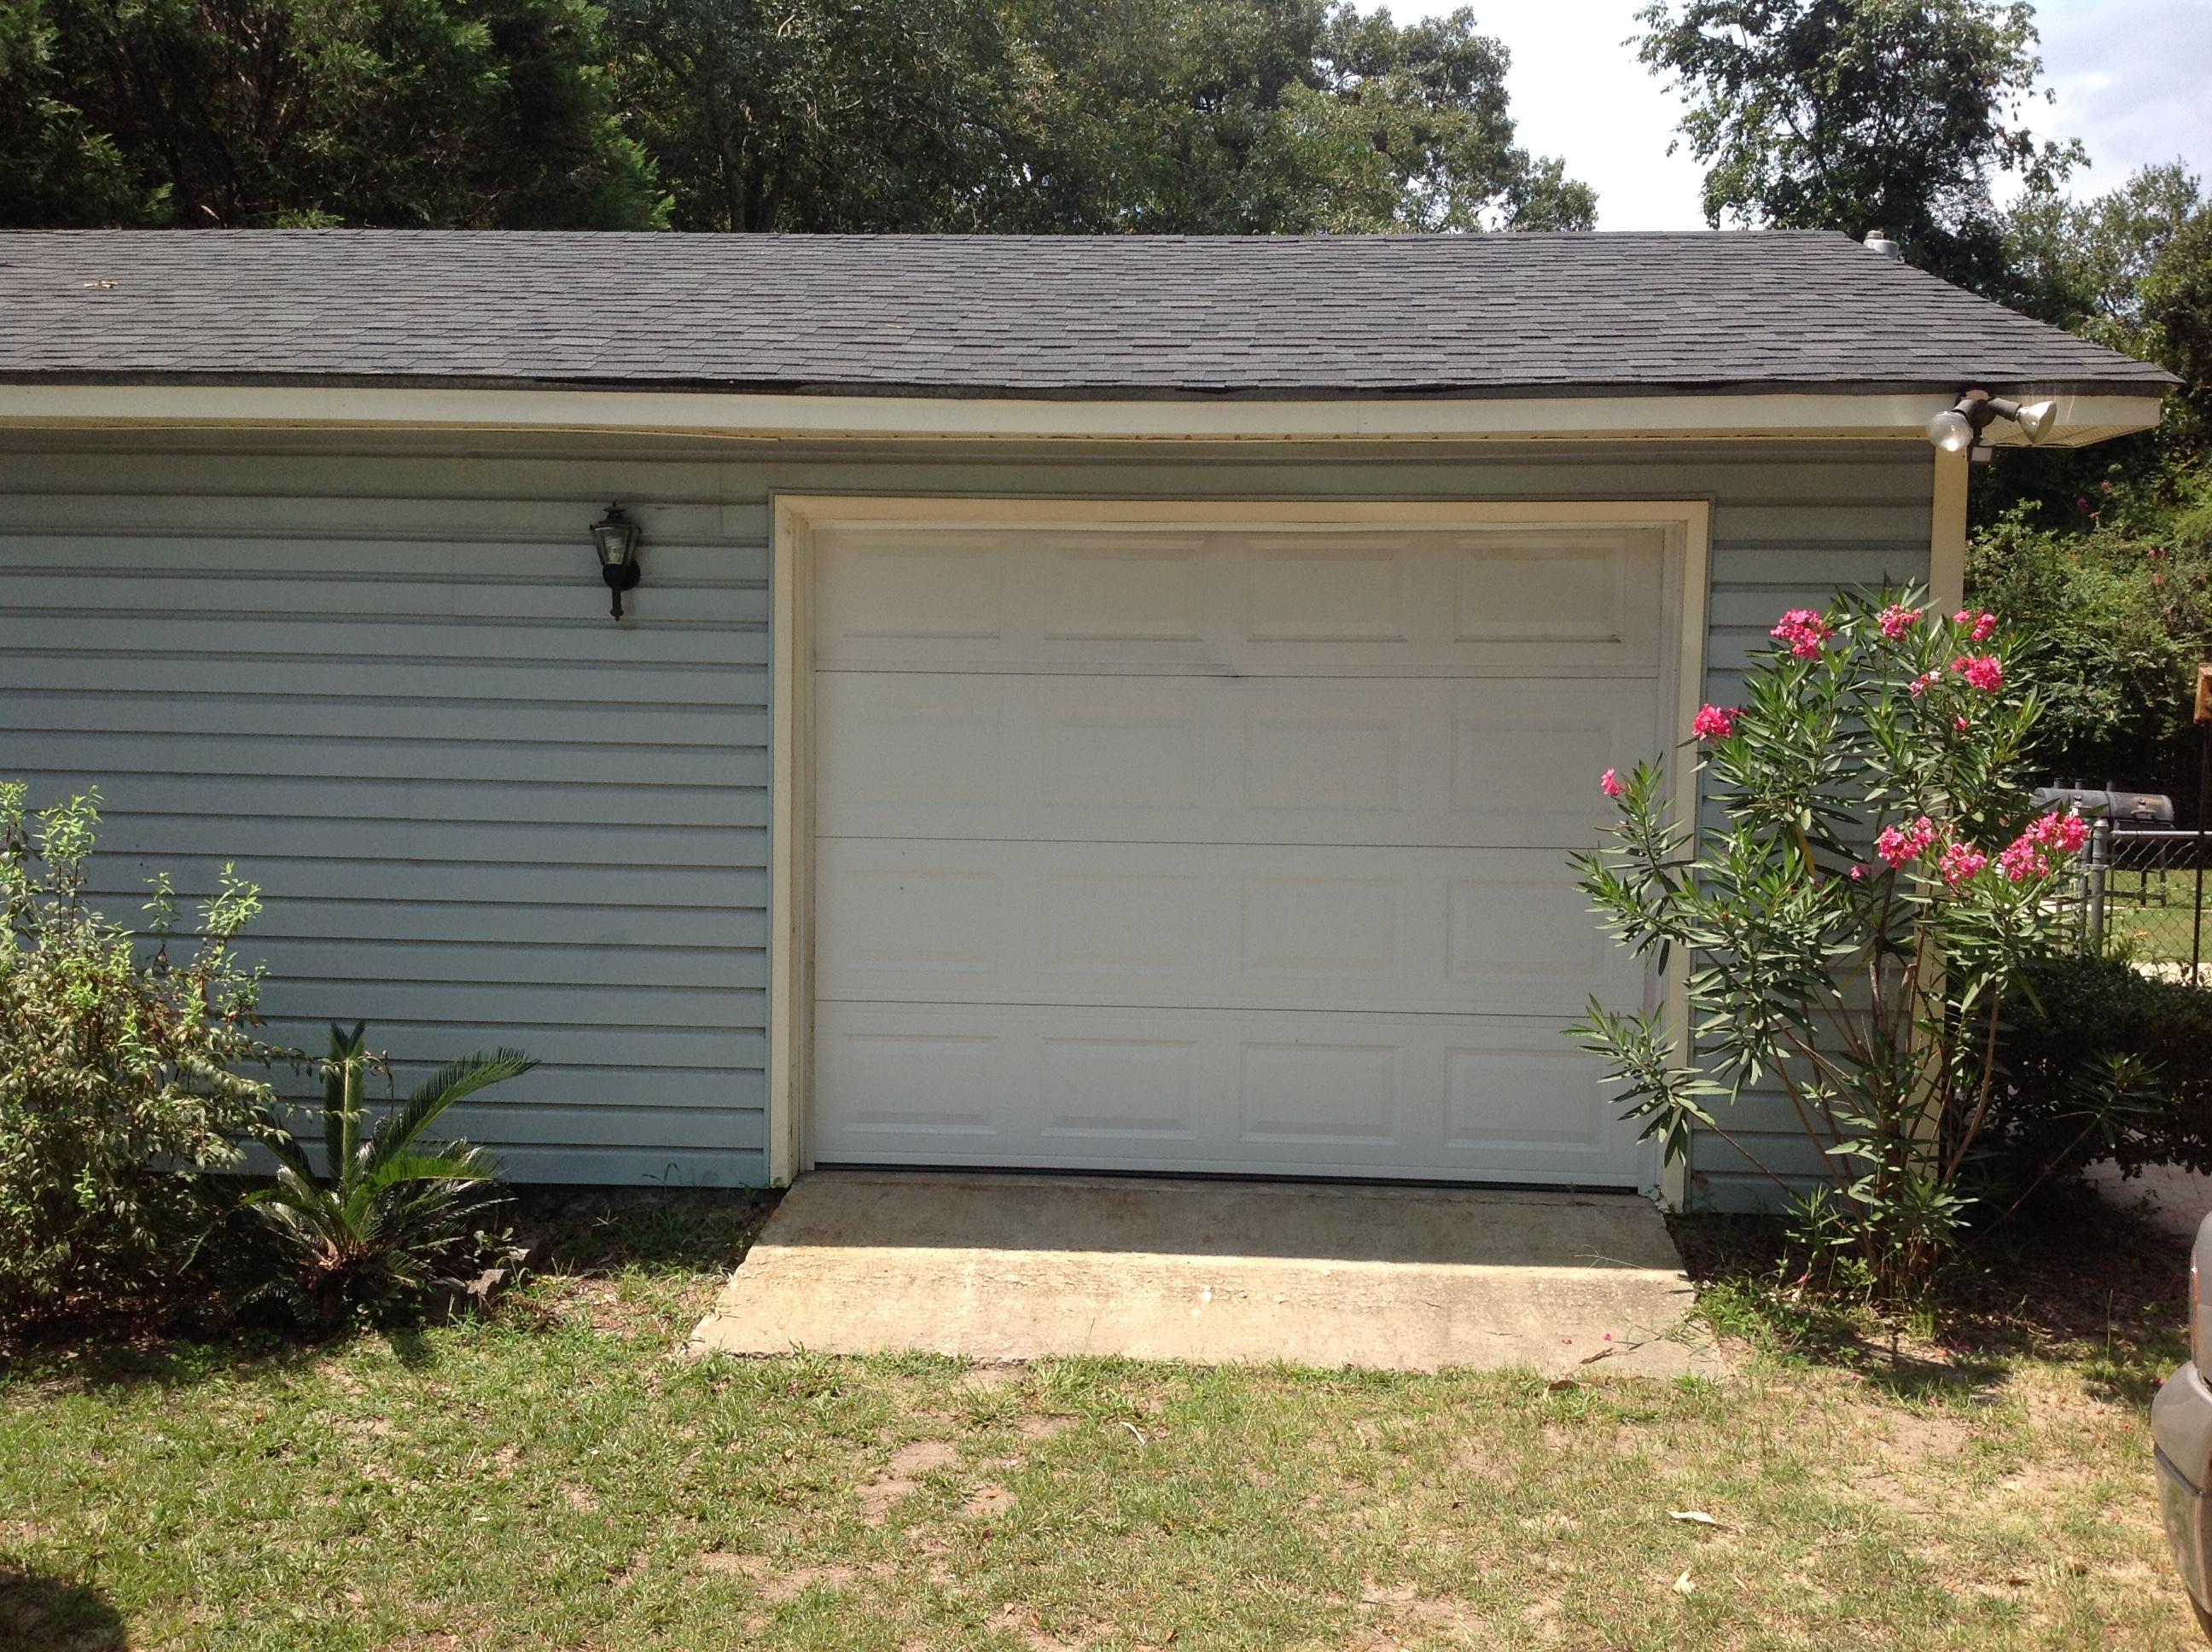 Belvedere II Homes For Sale - 122 Dogwood, Eutawville, SC - 0